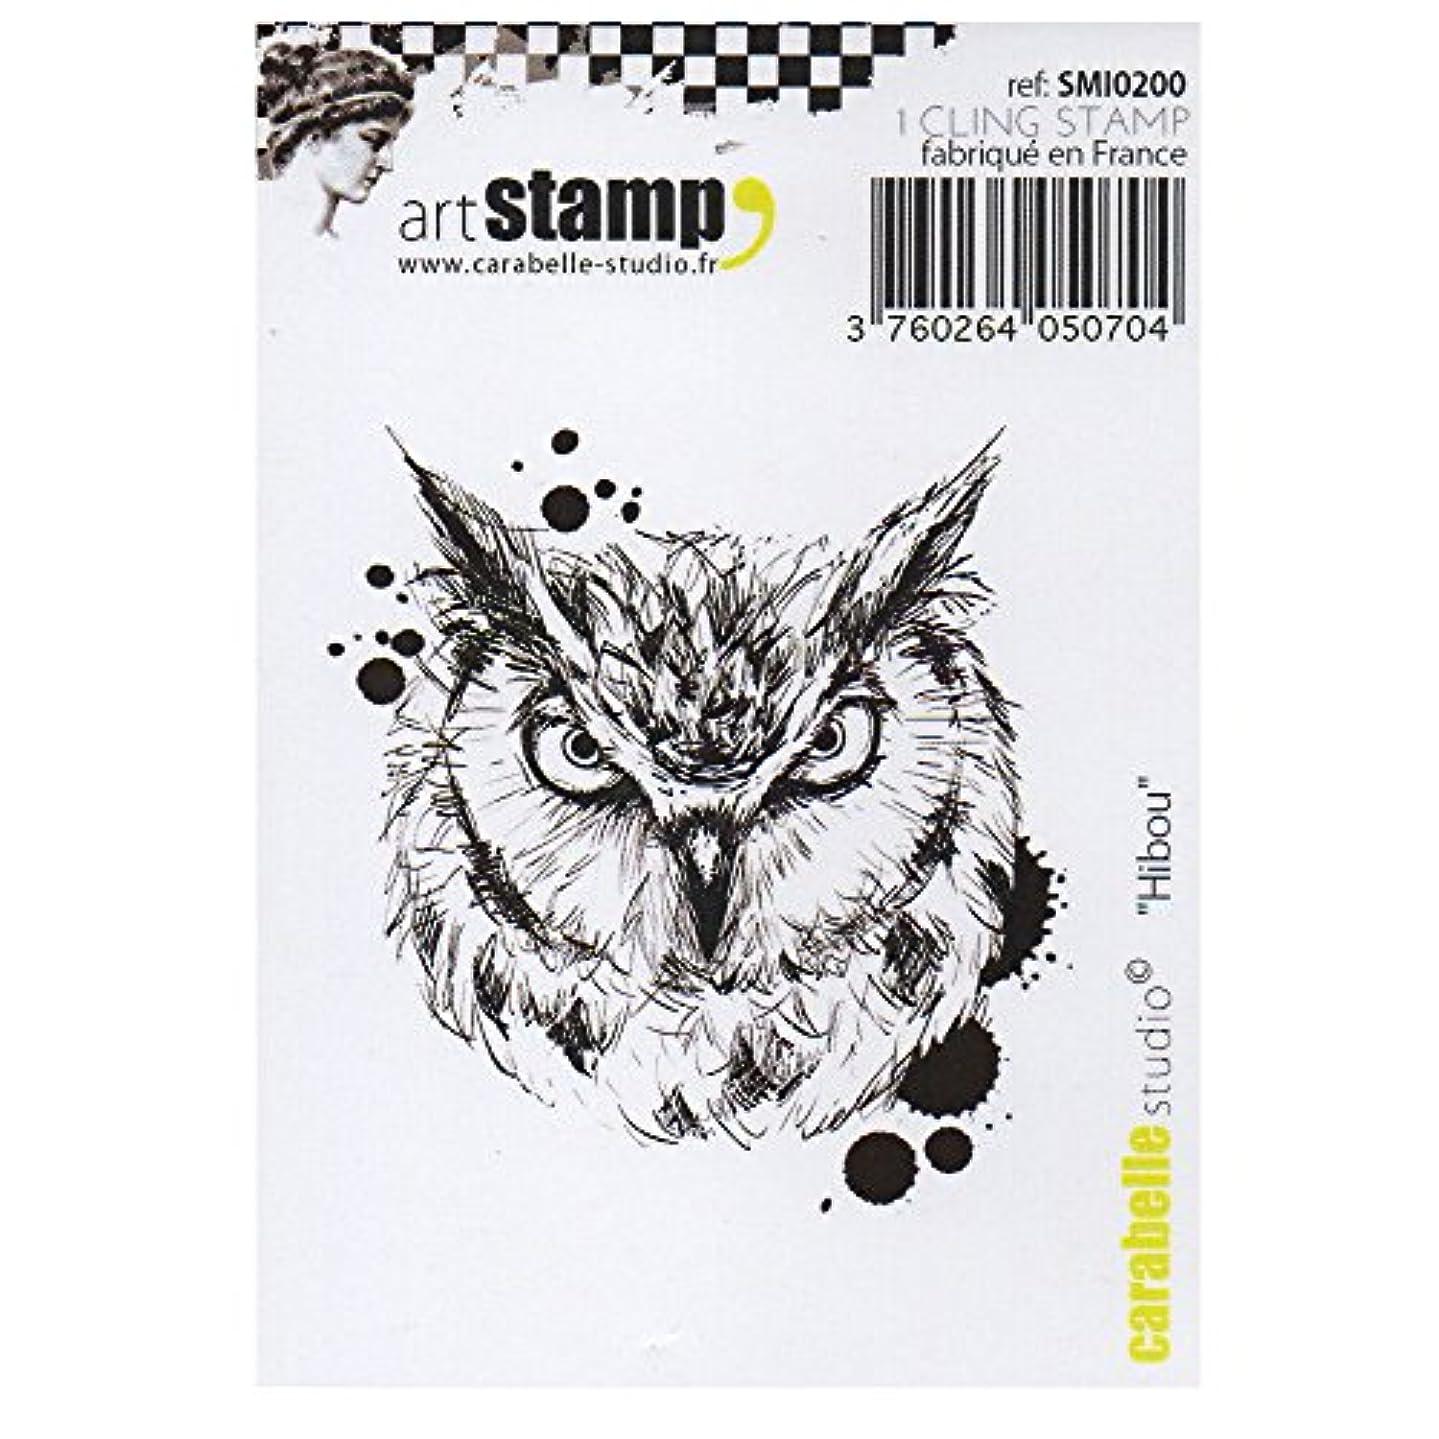 Carabelle Studio SMI0200 Cling Stamp - Hiboux (Owl)